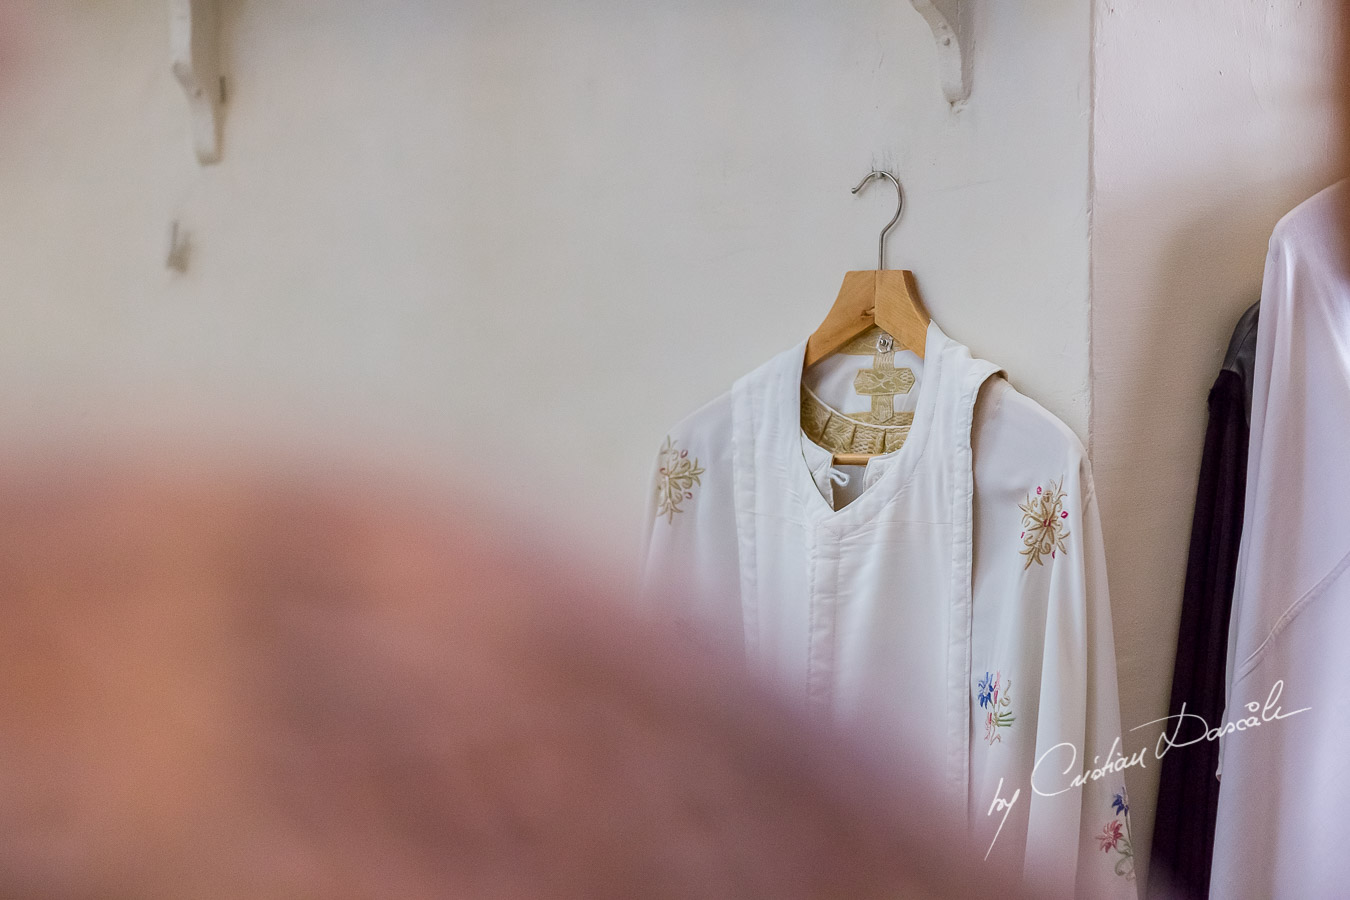 Baptism Photograher in Nicosia - Chrisanti's Christening by Cristian Dascalu - 11